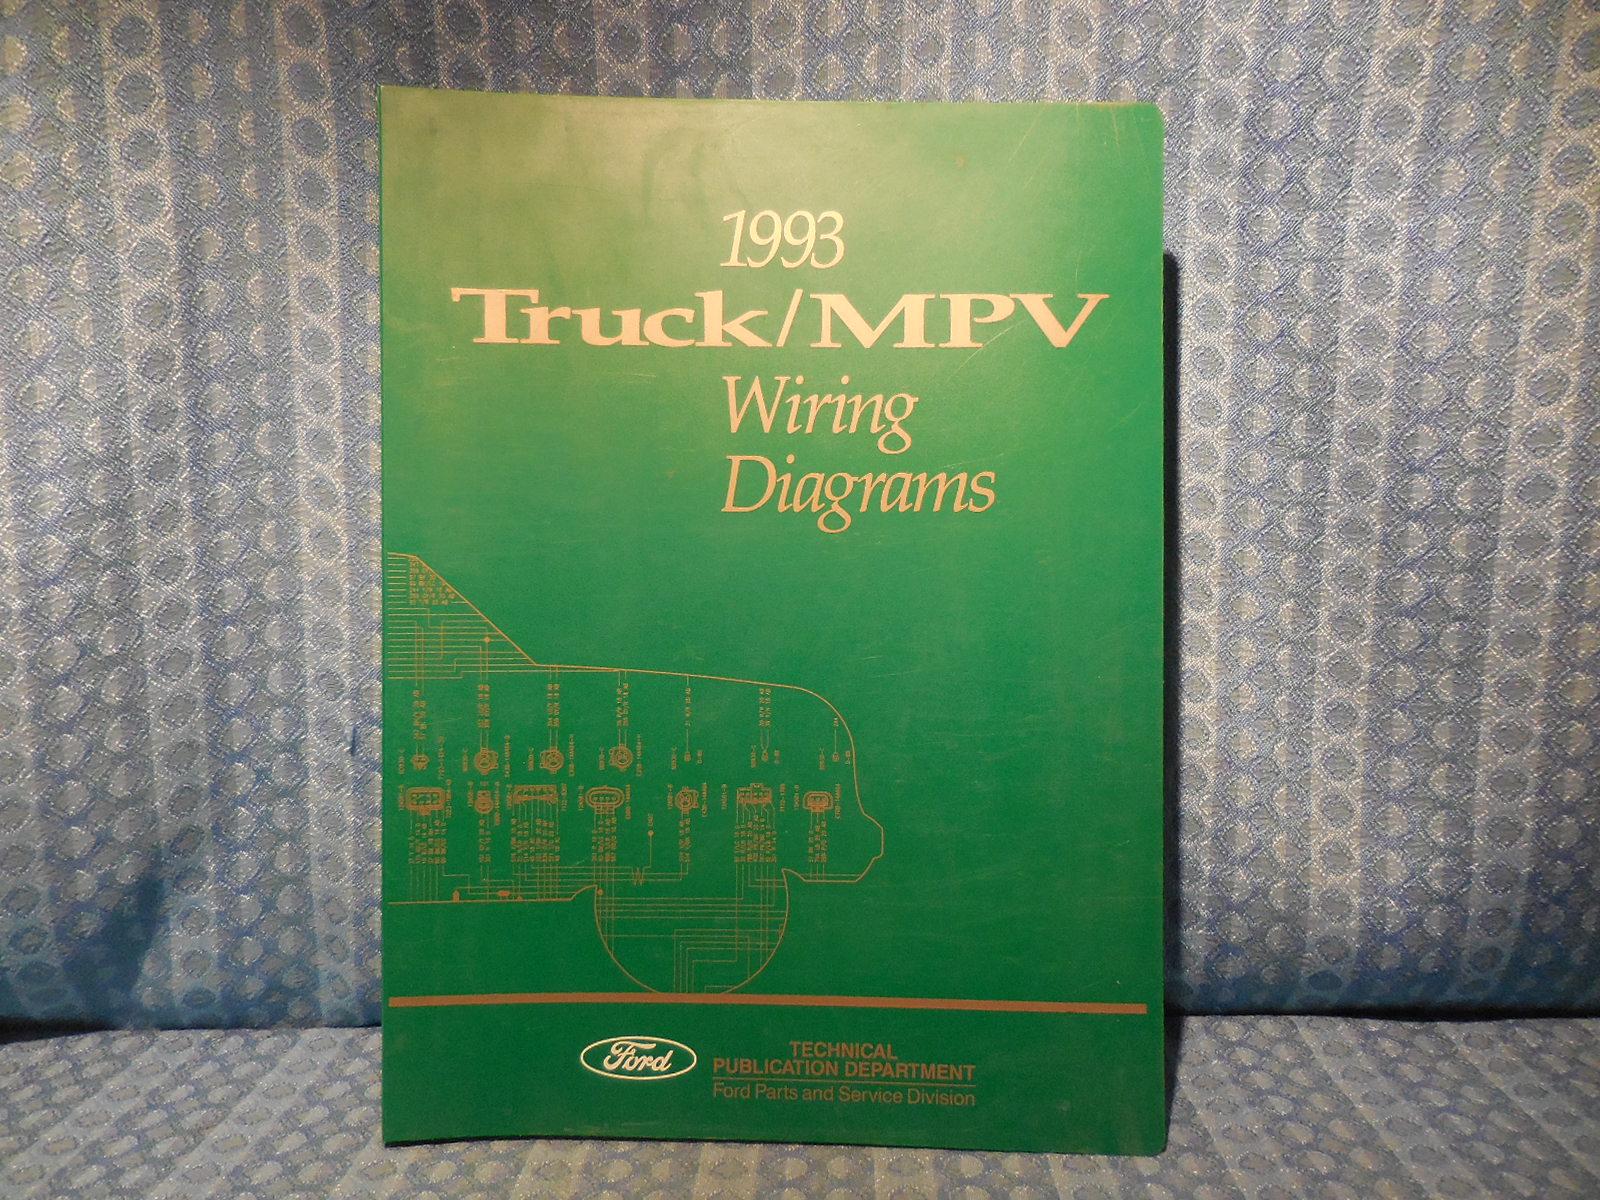 1993 ford truck oem wiring diagrams f150 800 ranger. Black Bedroom Furniture Sets. Home Design Ideas